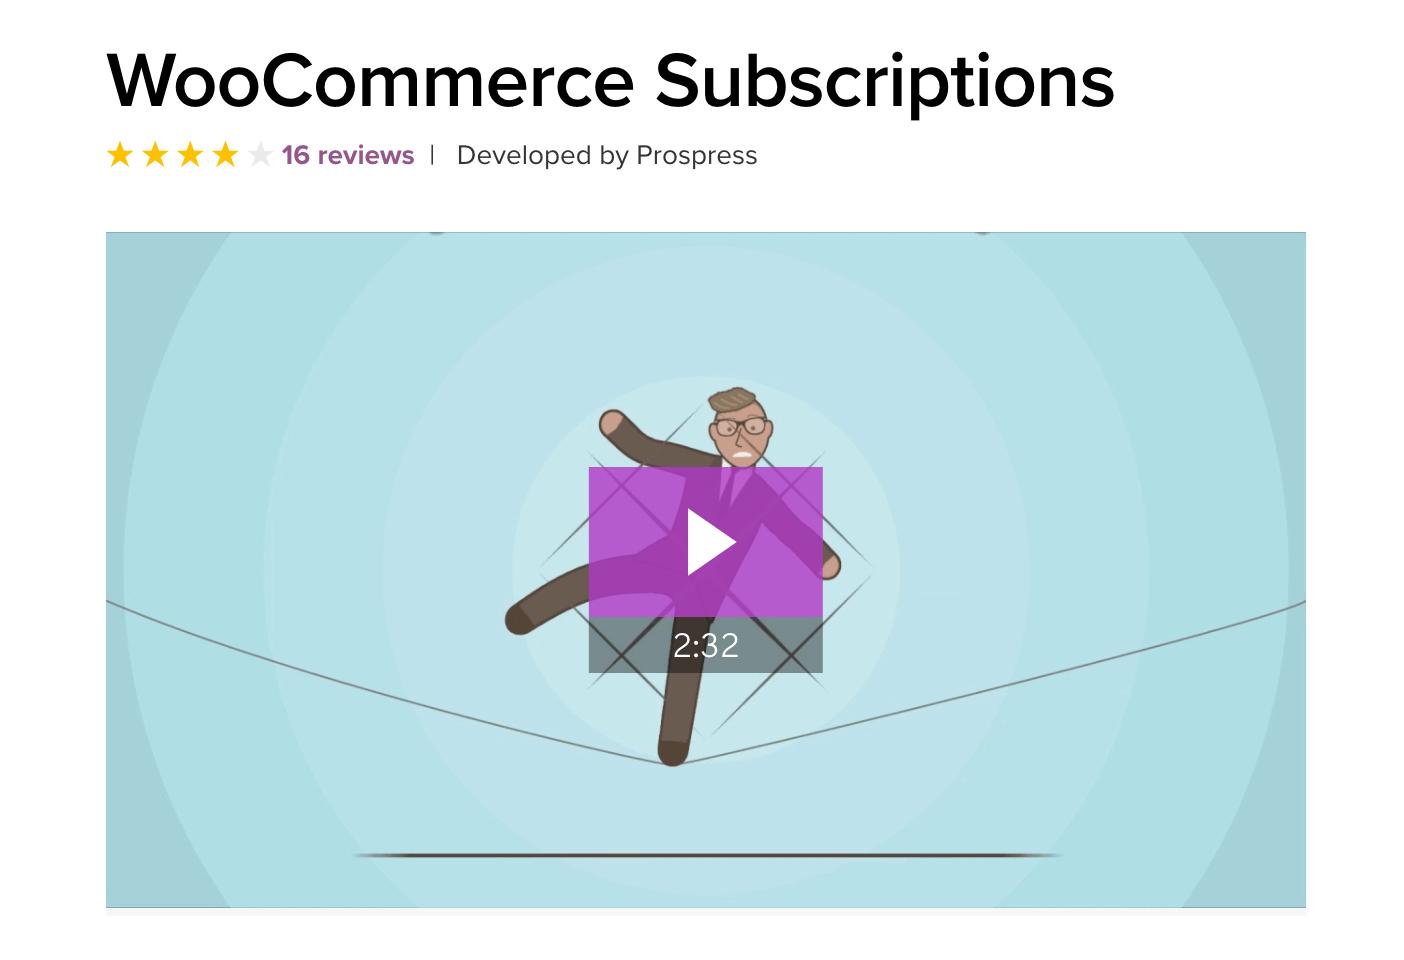 De WooCommerce Subscriptions uitbreiding